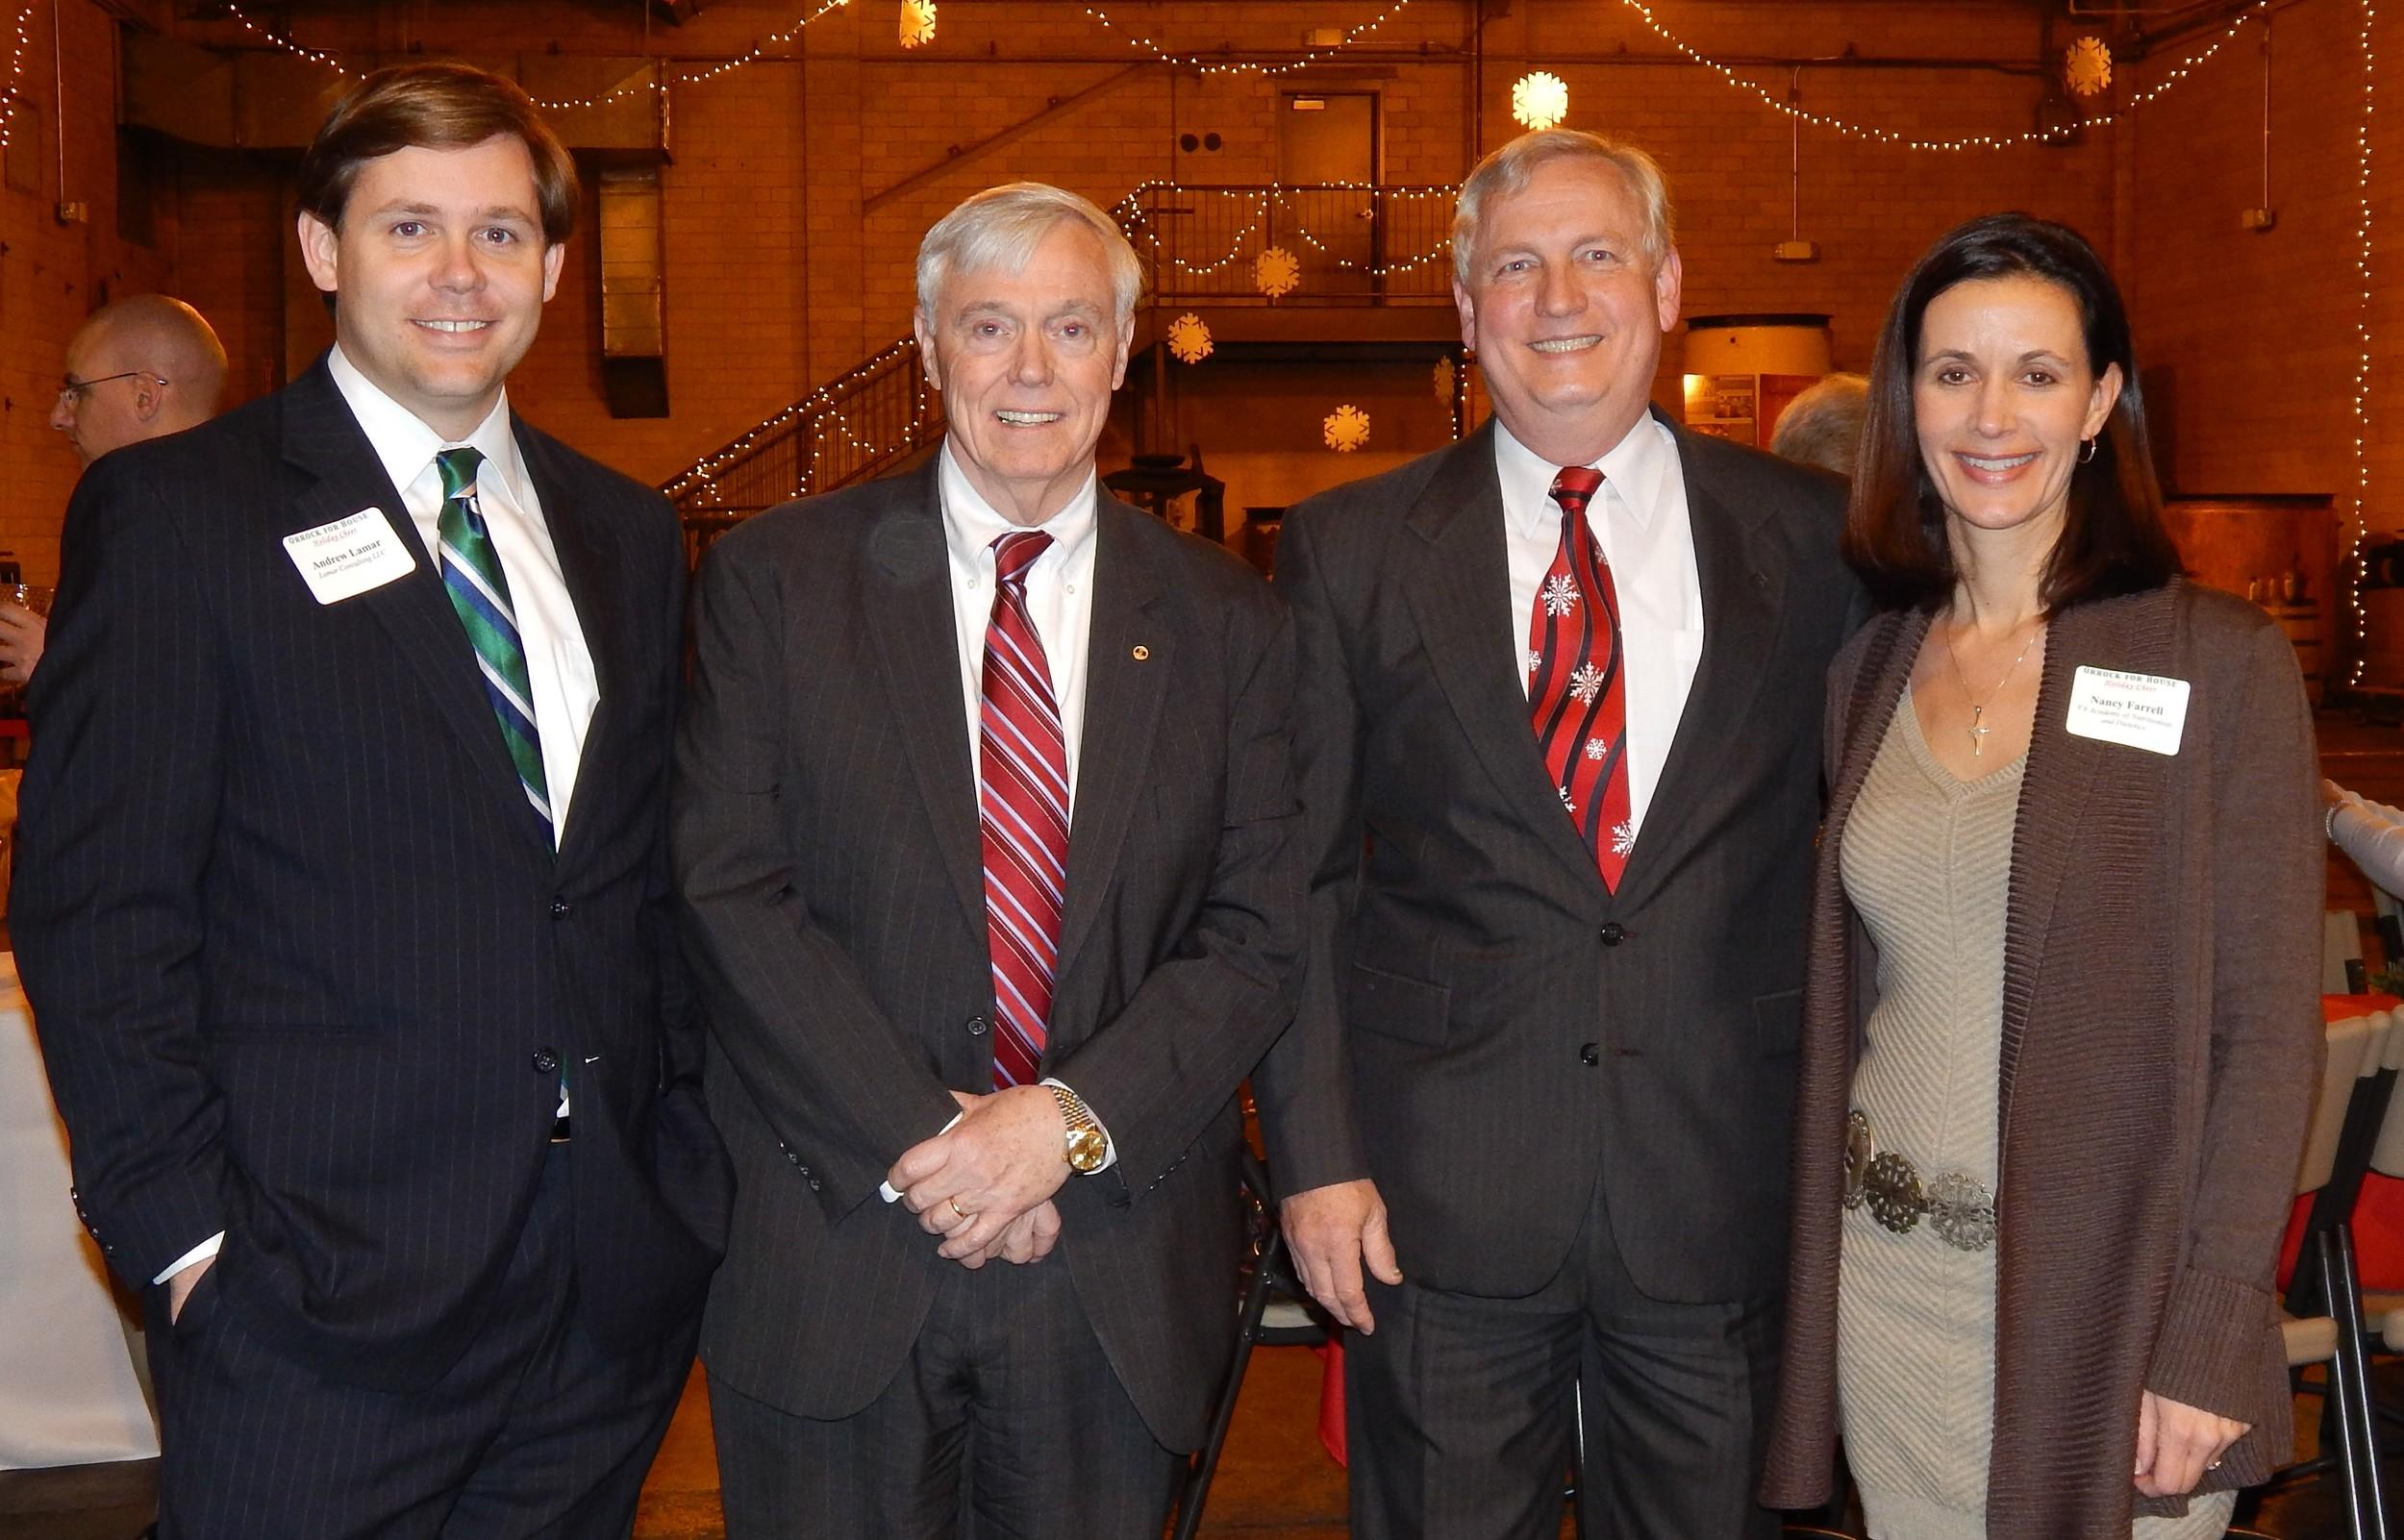 Fundraiser with VAND Legislative Consultant Andrew Lamar, VirginiaSpeaker Bill Howell (R) andVirginia Delegate Bobby Orrock (R).